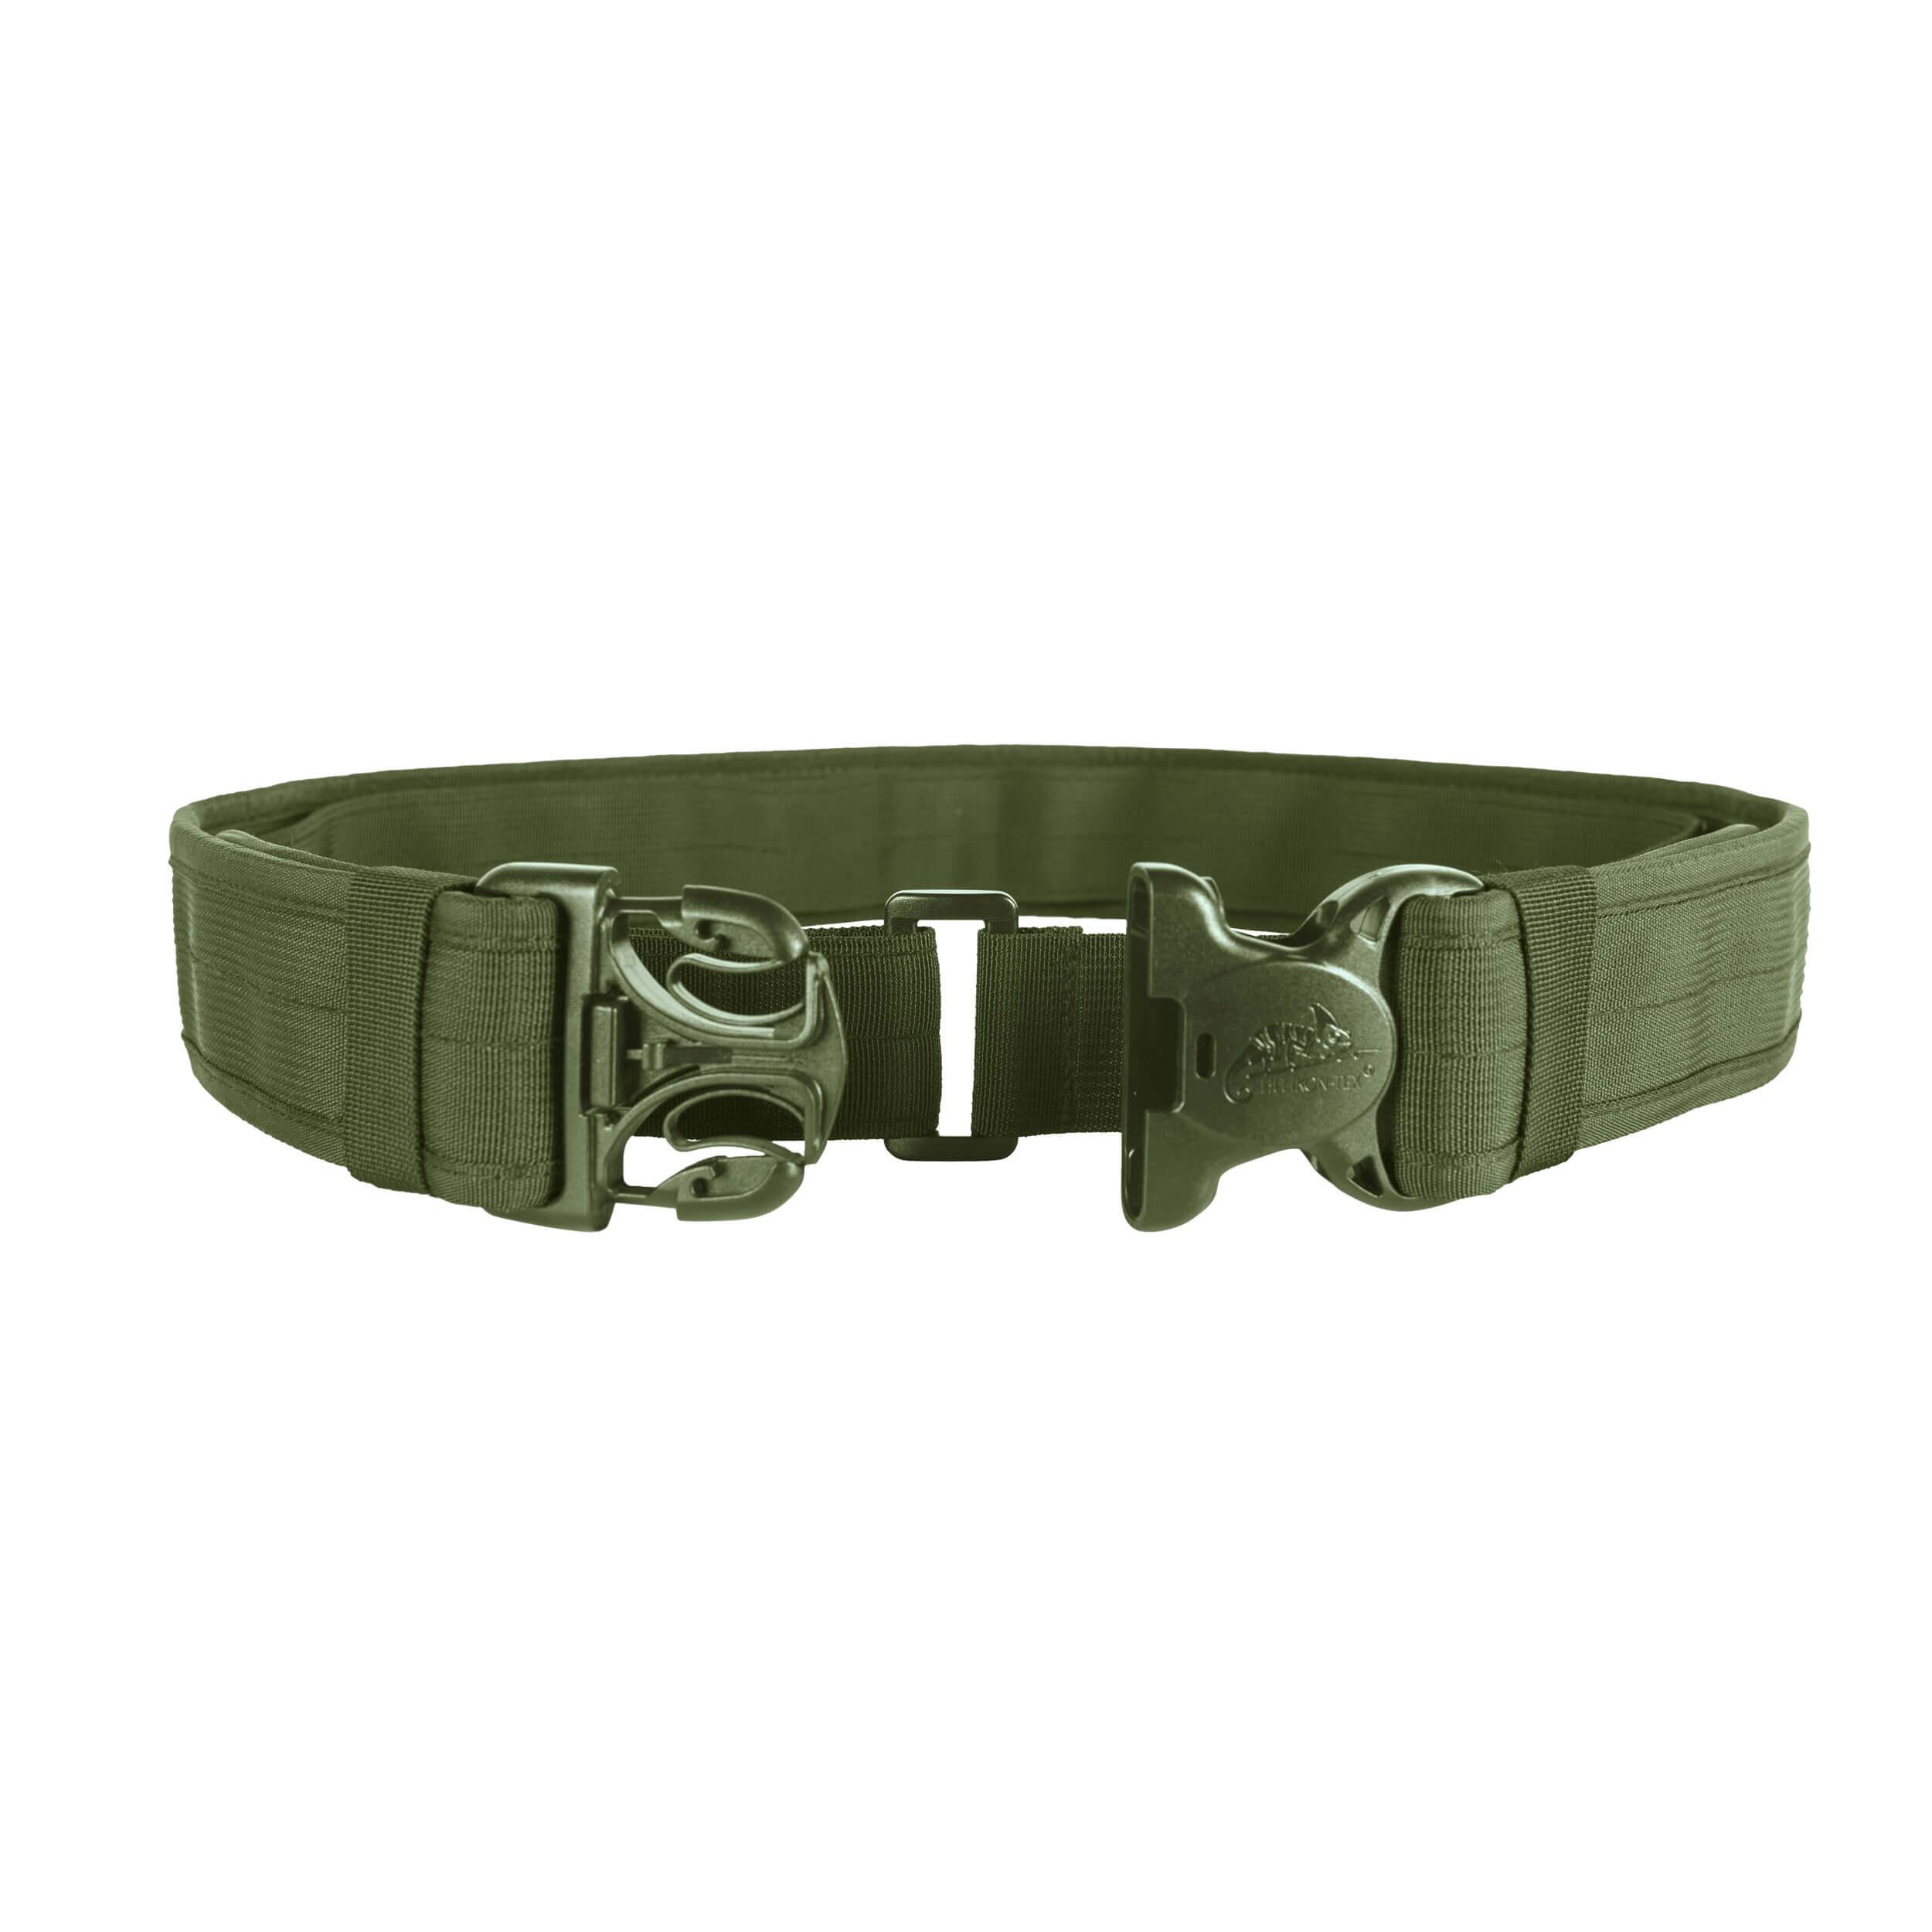 Helikon-Tex Defender Security Gürtel - Olive Green